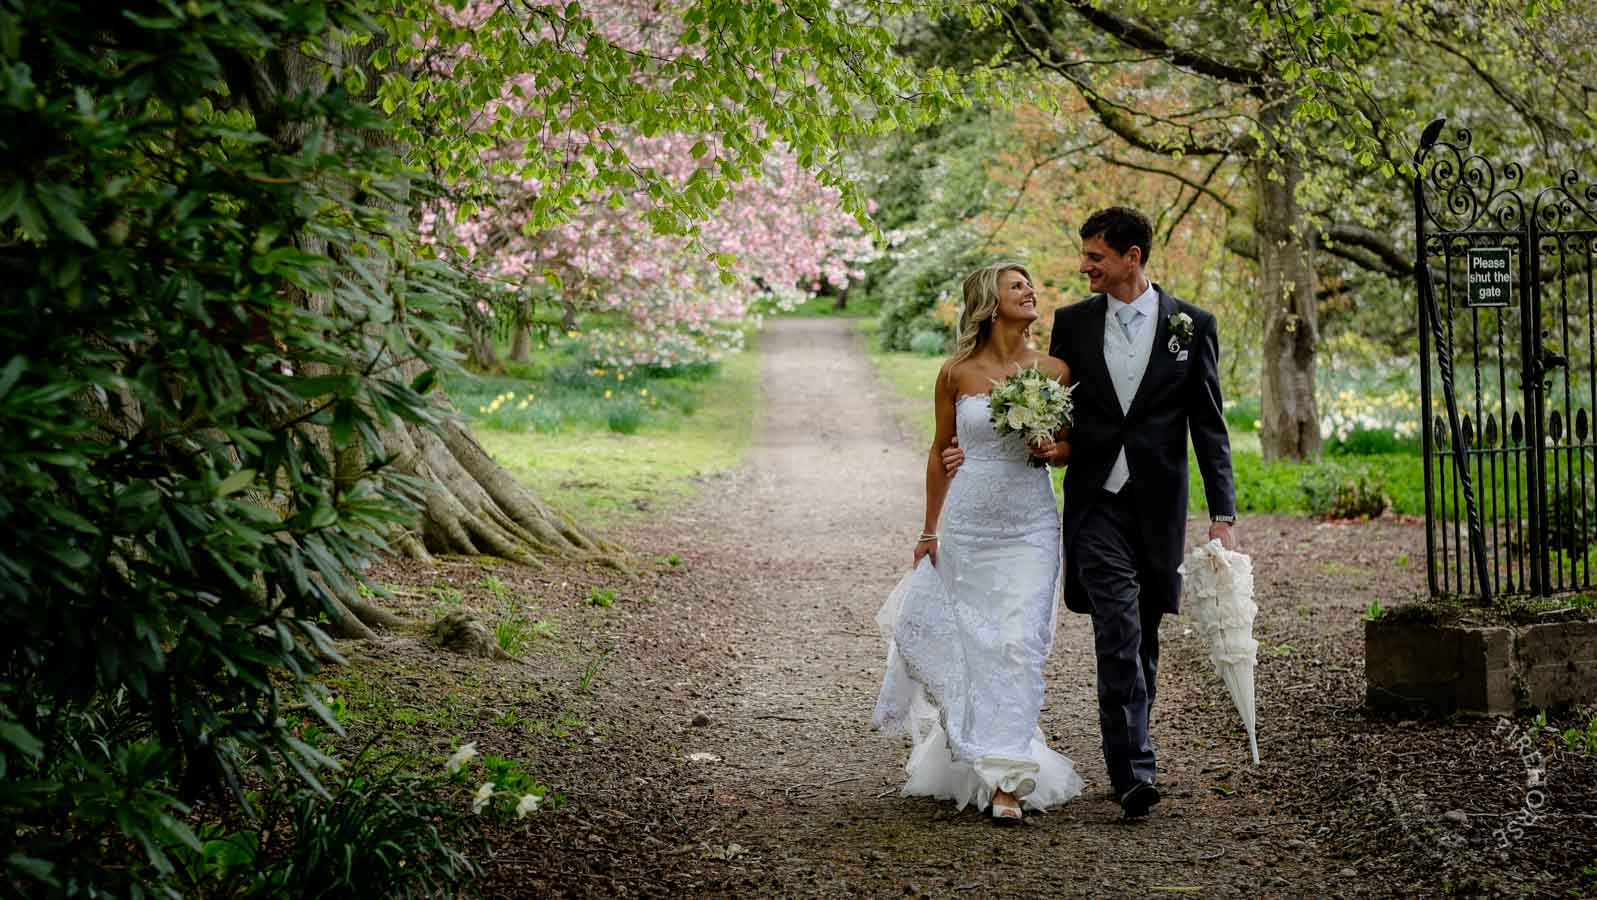 Swinton-Park-Spring-Wedding-245